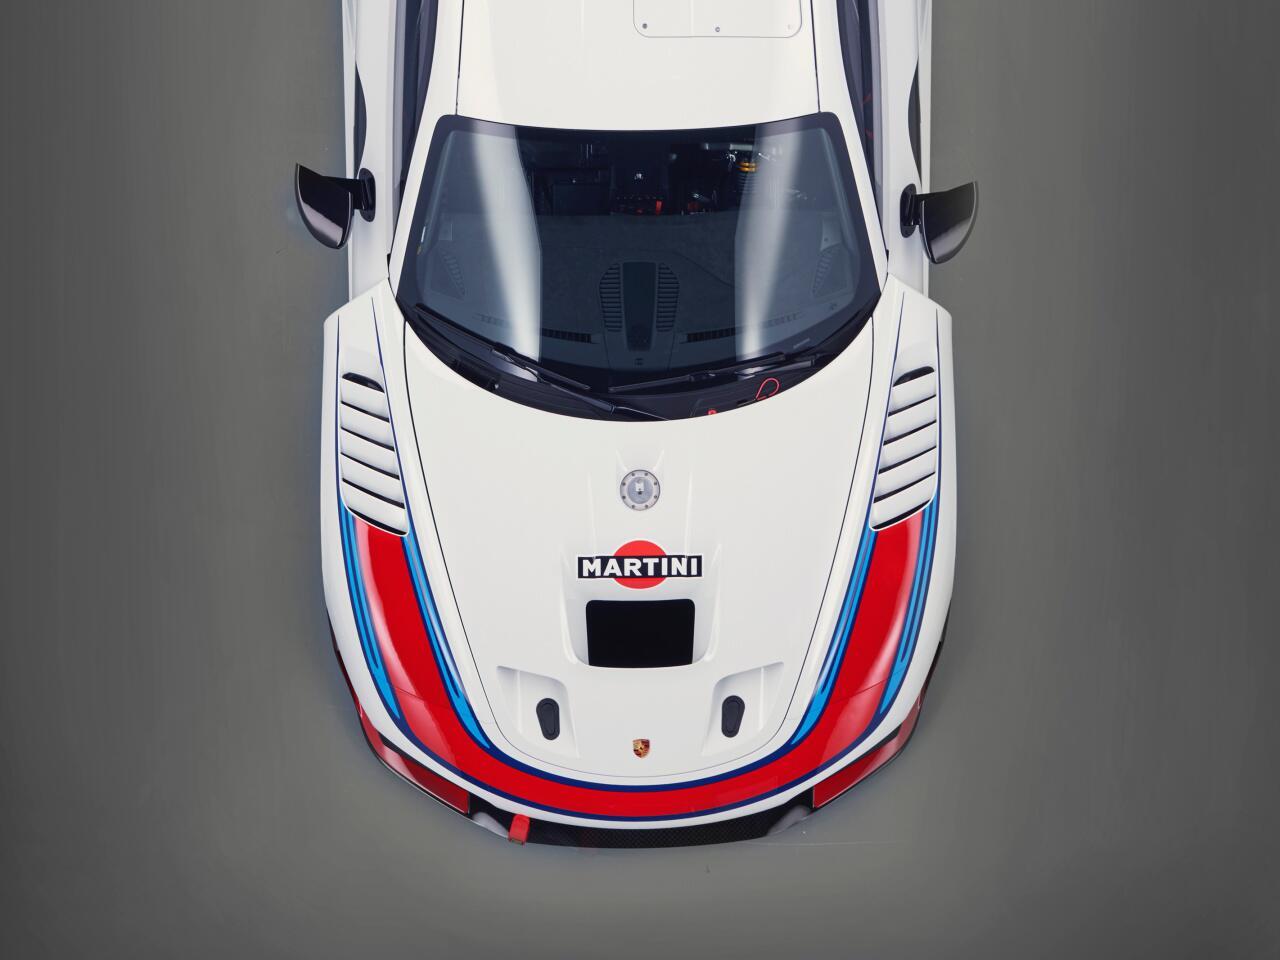 Bild zu Le Mans lässt grüssen